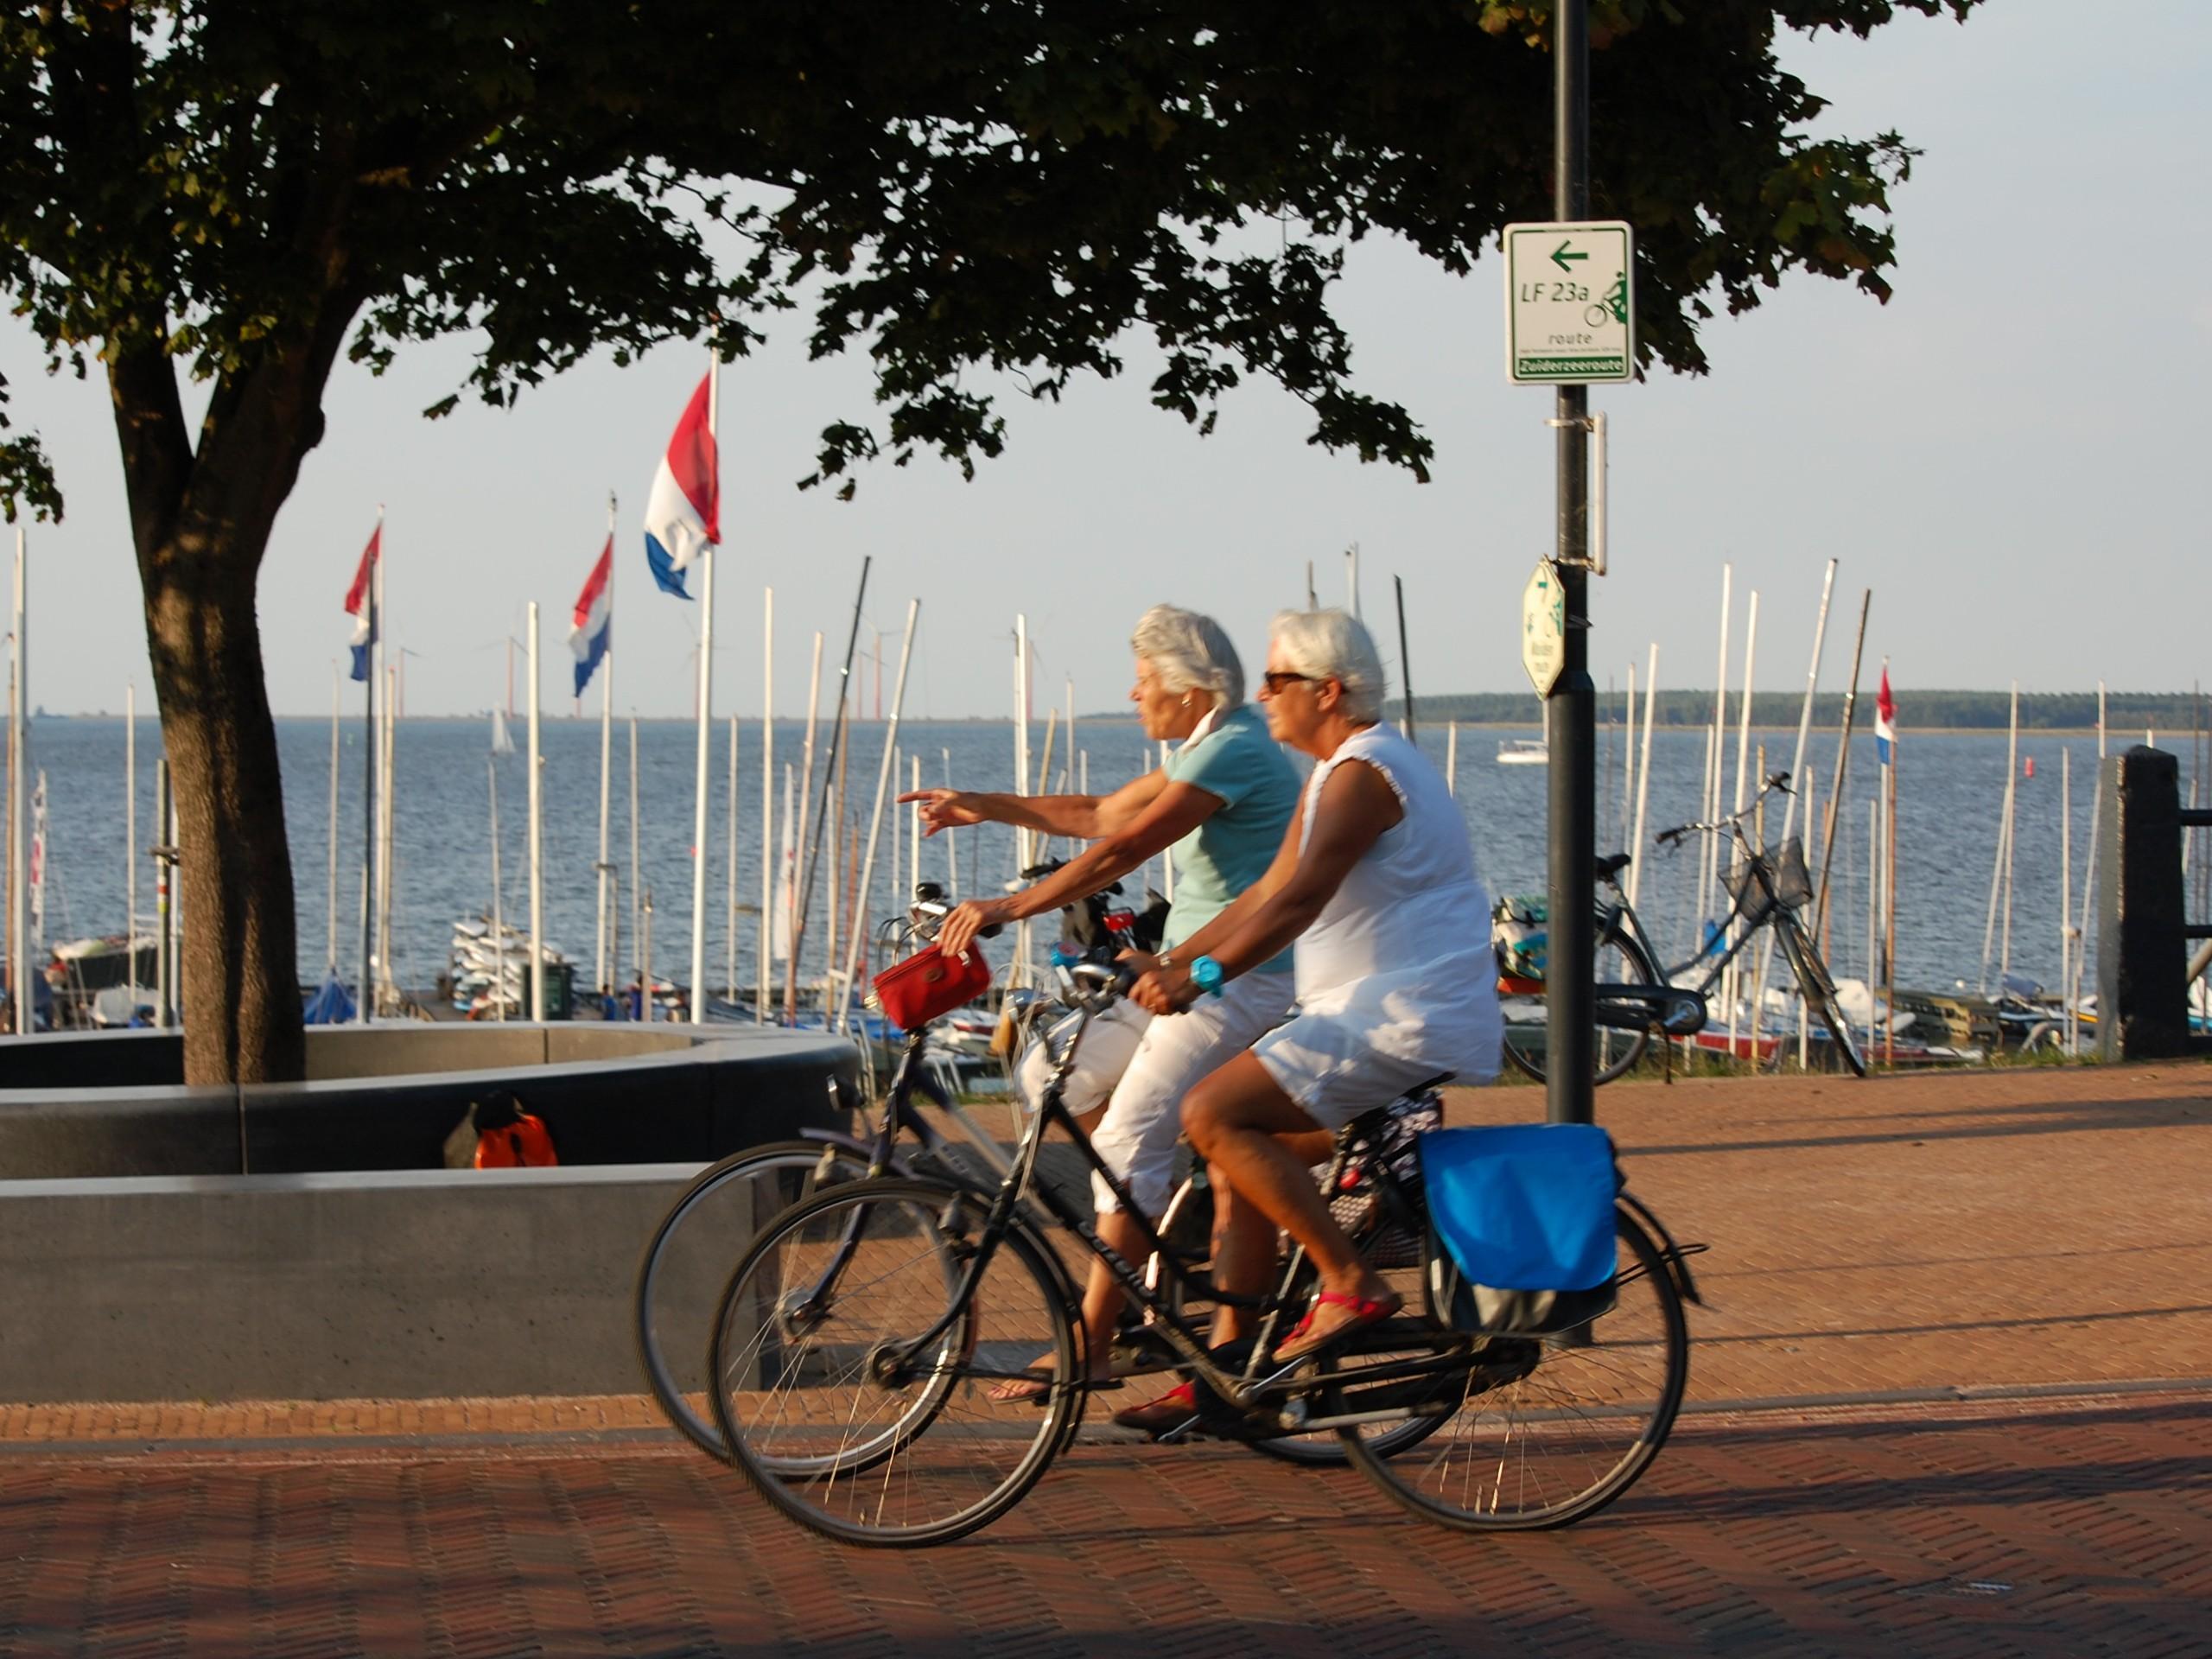 Couple biking in the promenade of Muiderberg